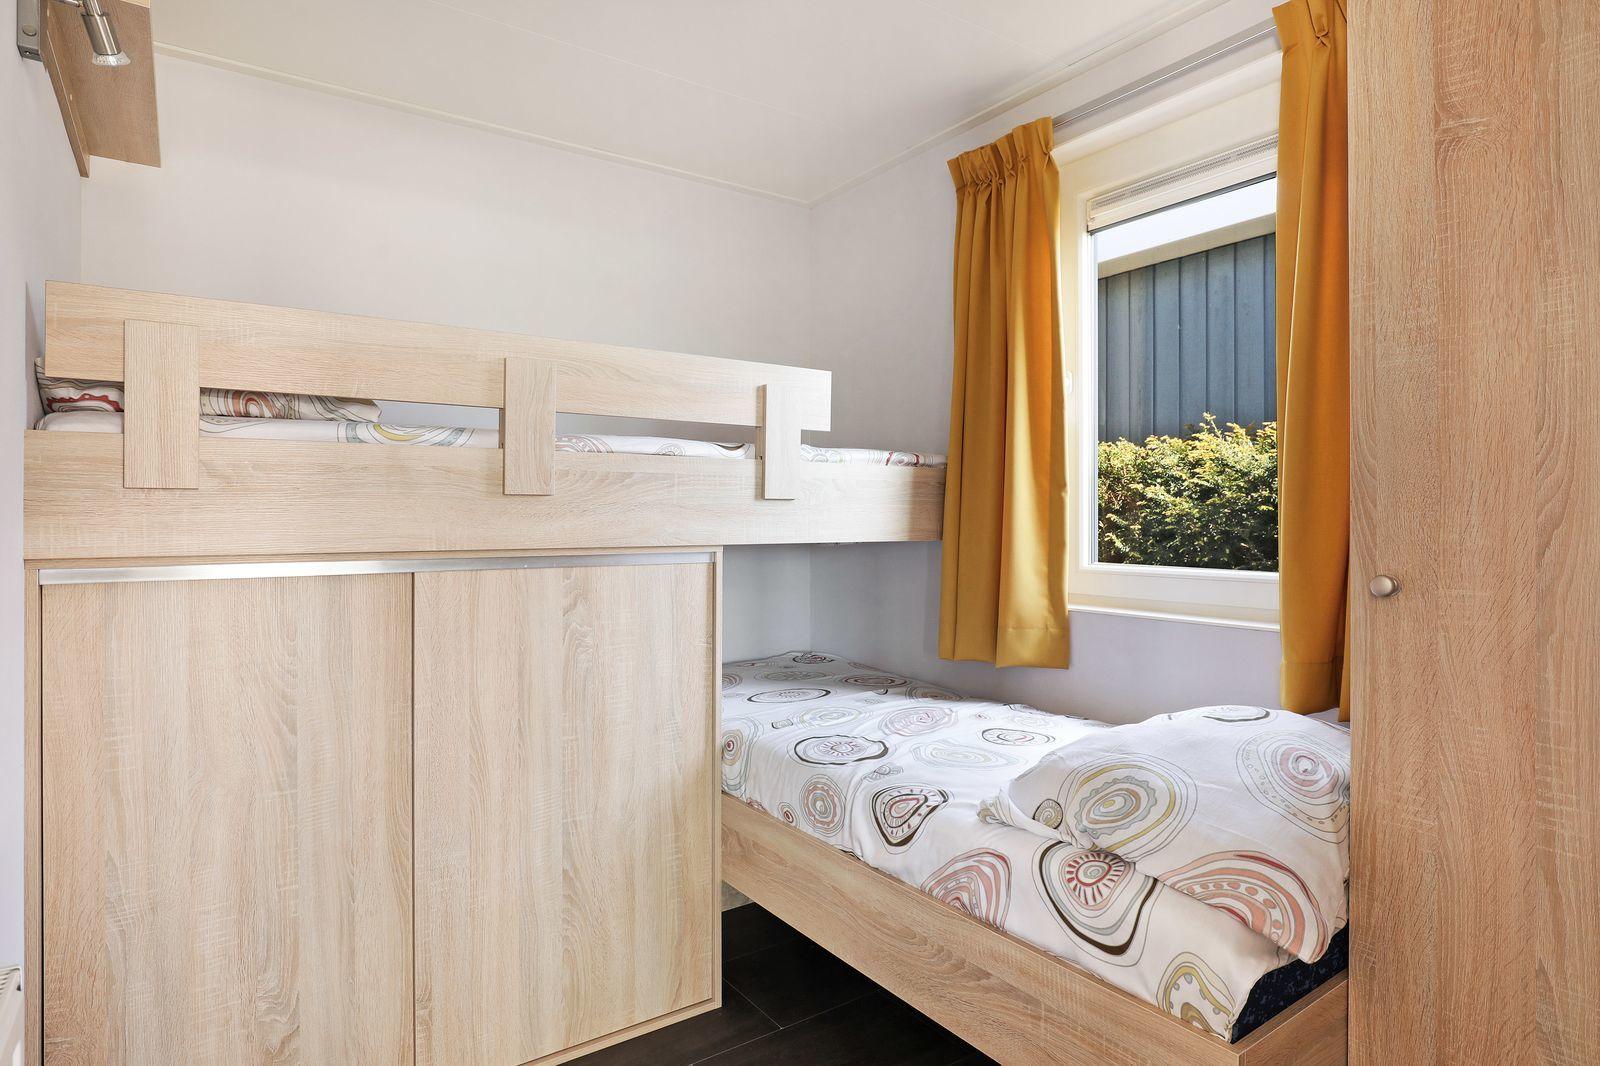 Duinvilla: 6-persoons, 3 slaapkamers